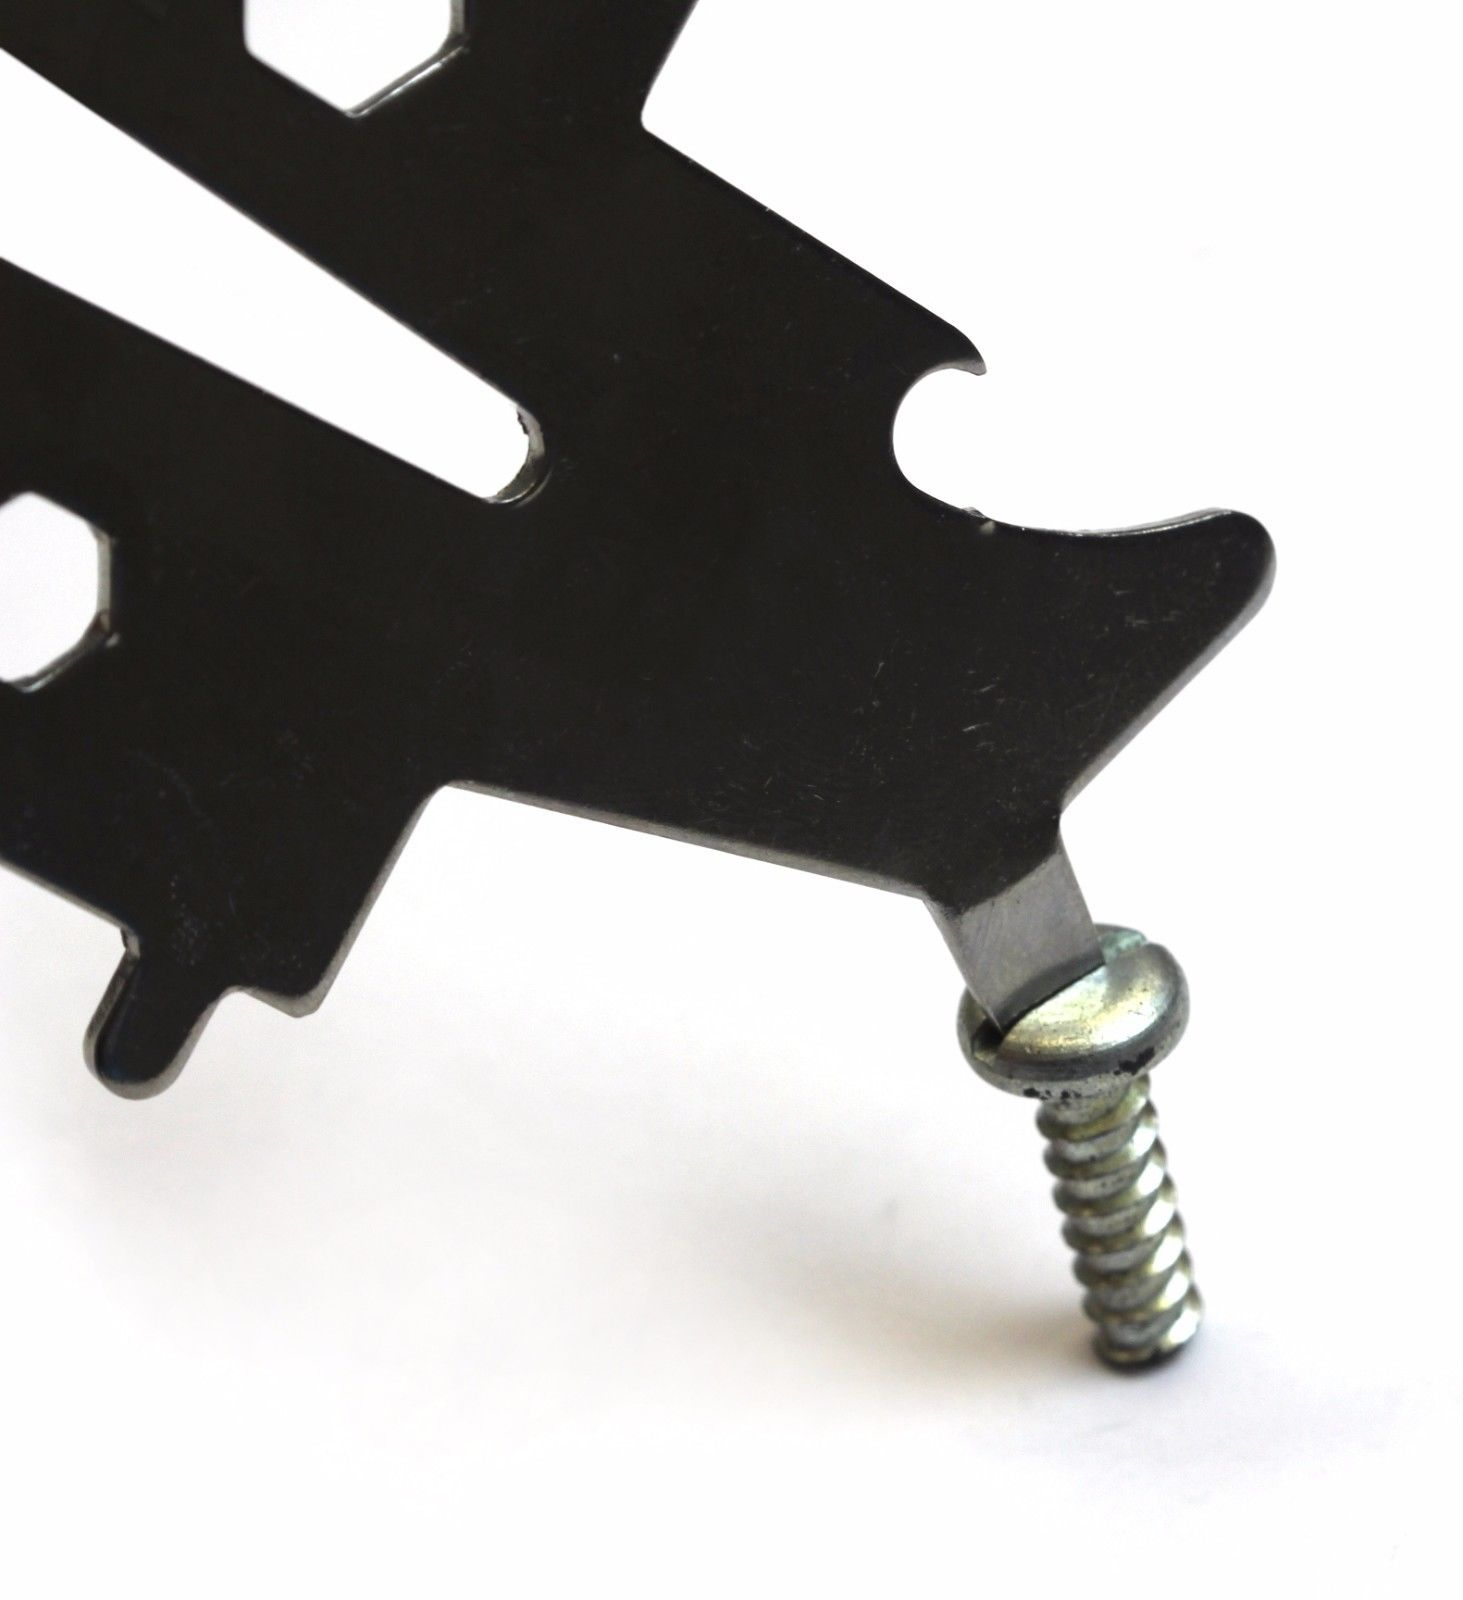 Multiuse Universal Deck Plate Gas Fuel Waste Cap Key